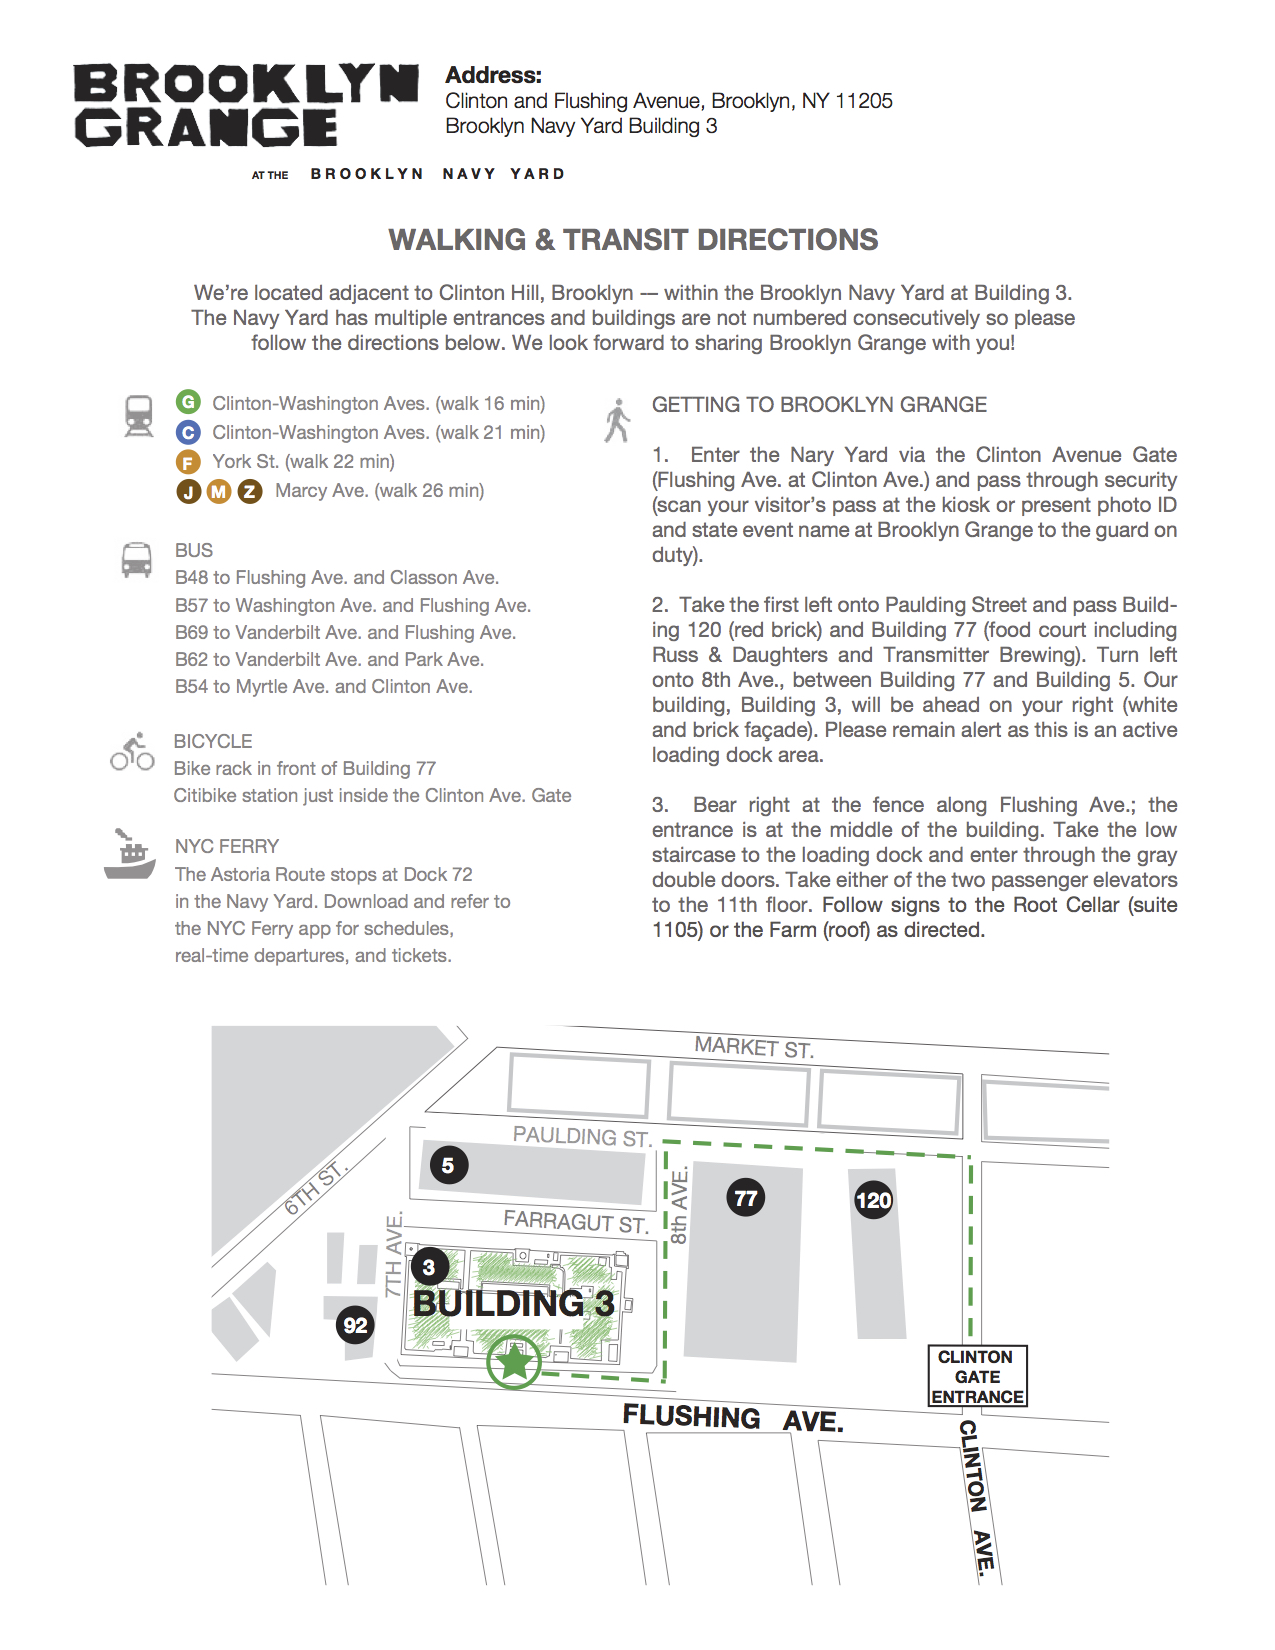 BNY walking directions 2019.jpg